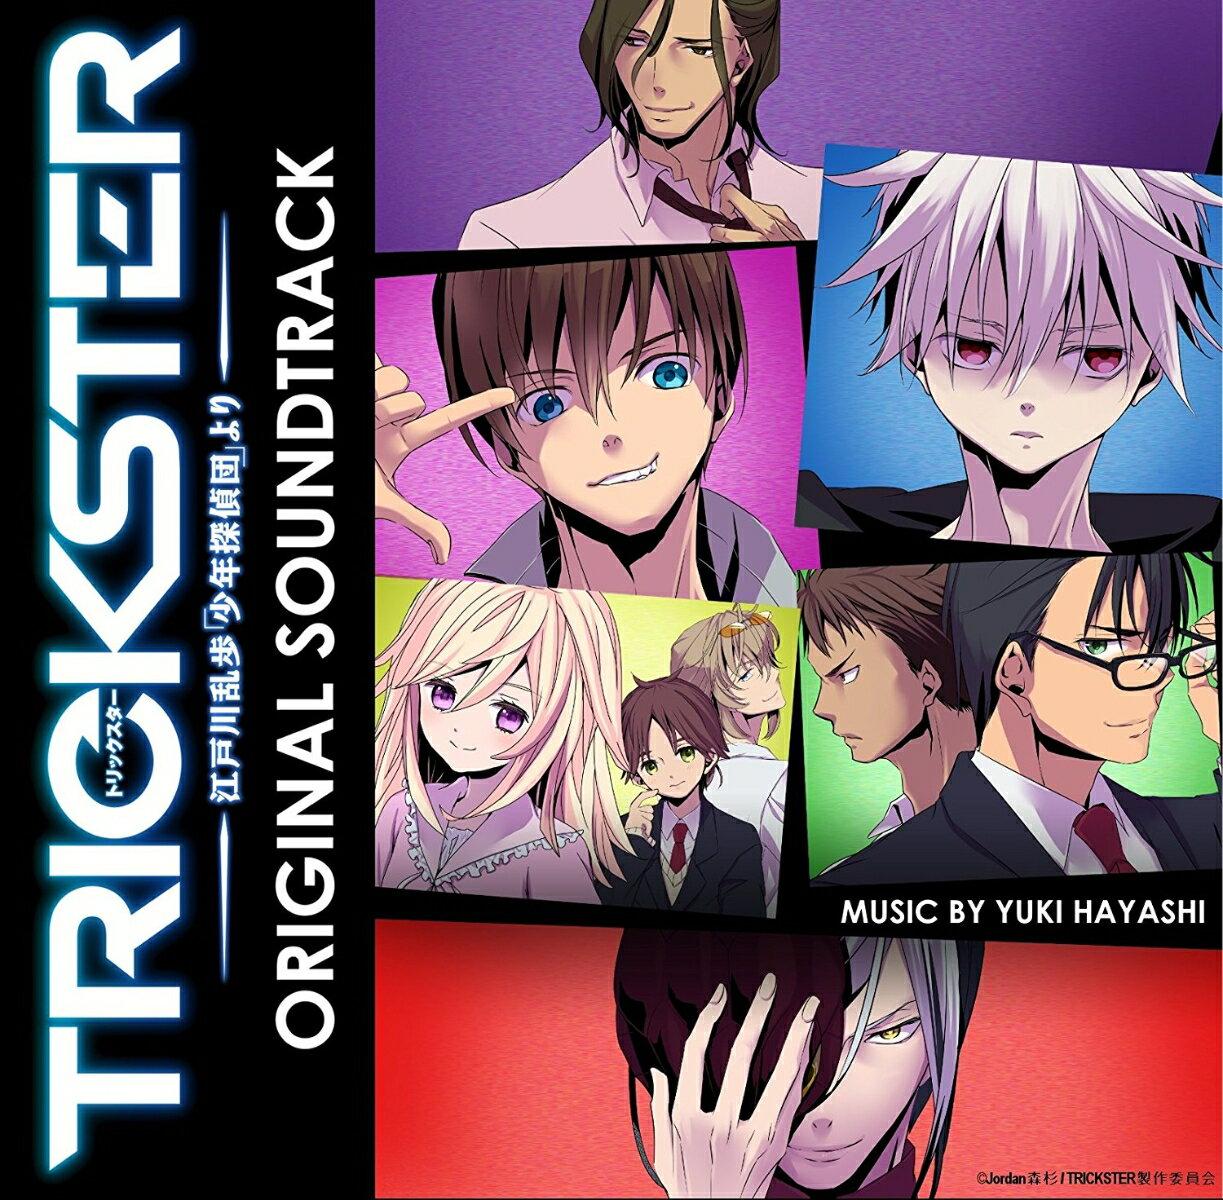 TRICKSTER-江戸川乱歩「少年探偵団」よりーオリジナルサウンドトラック画像